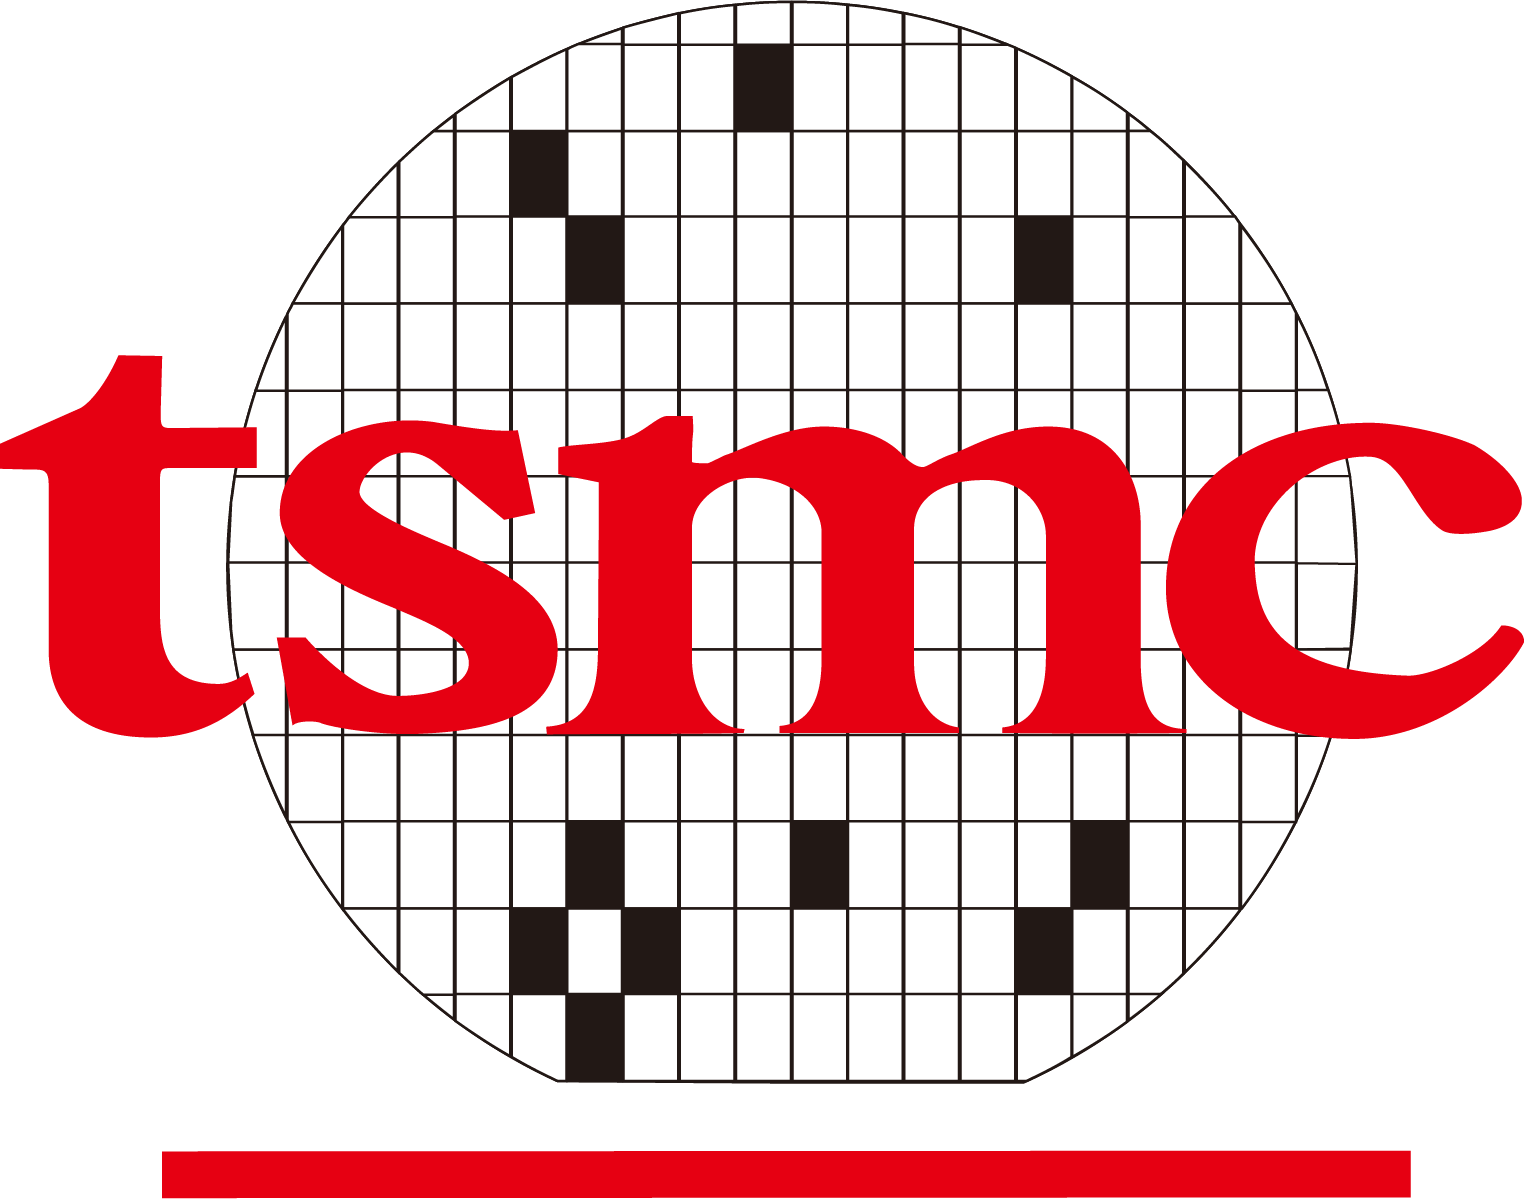 TSMC Logo png